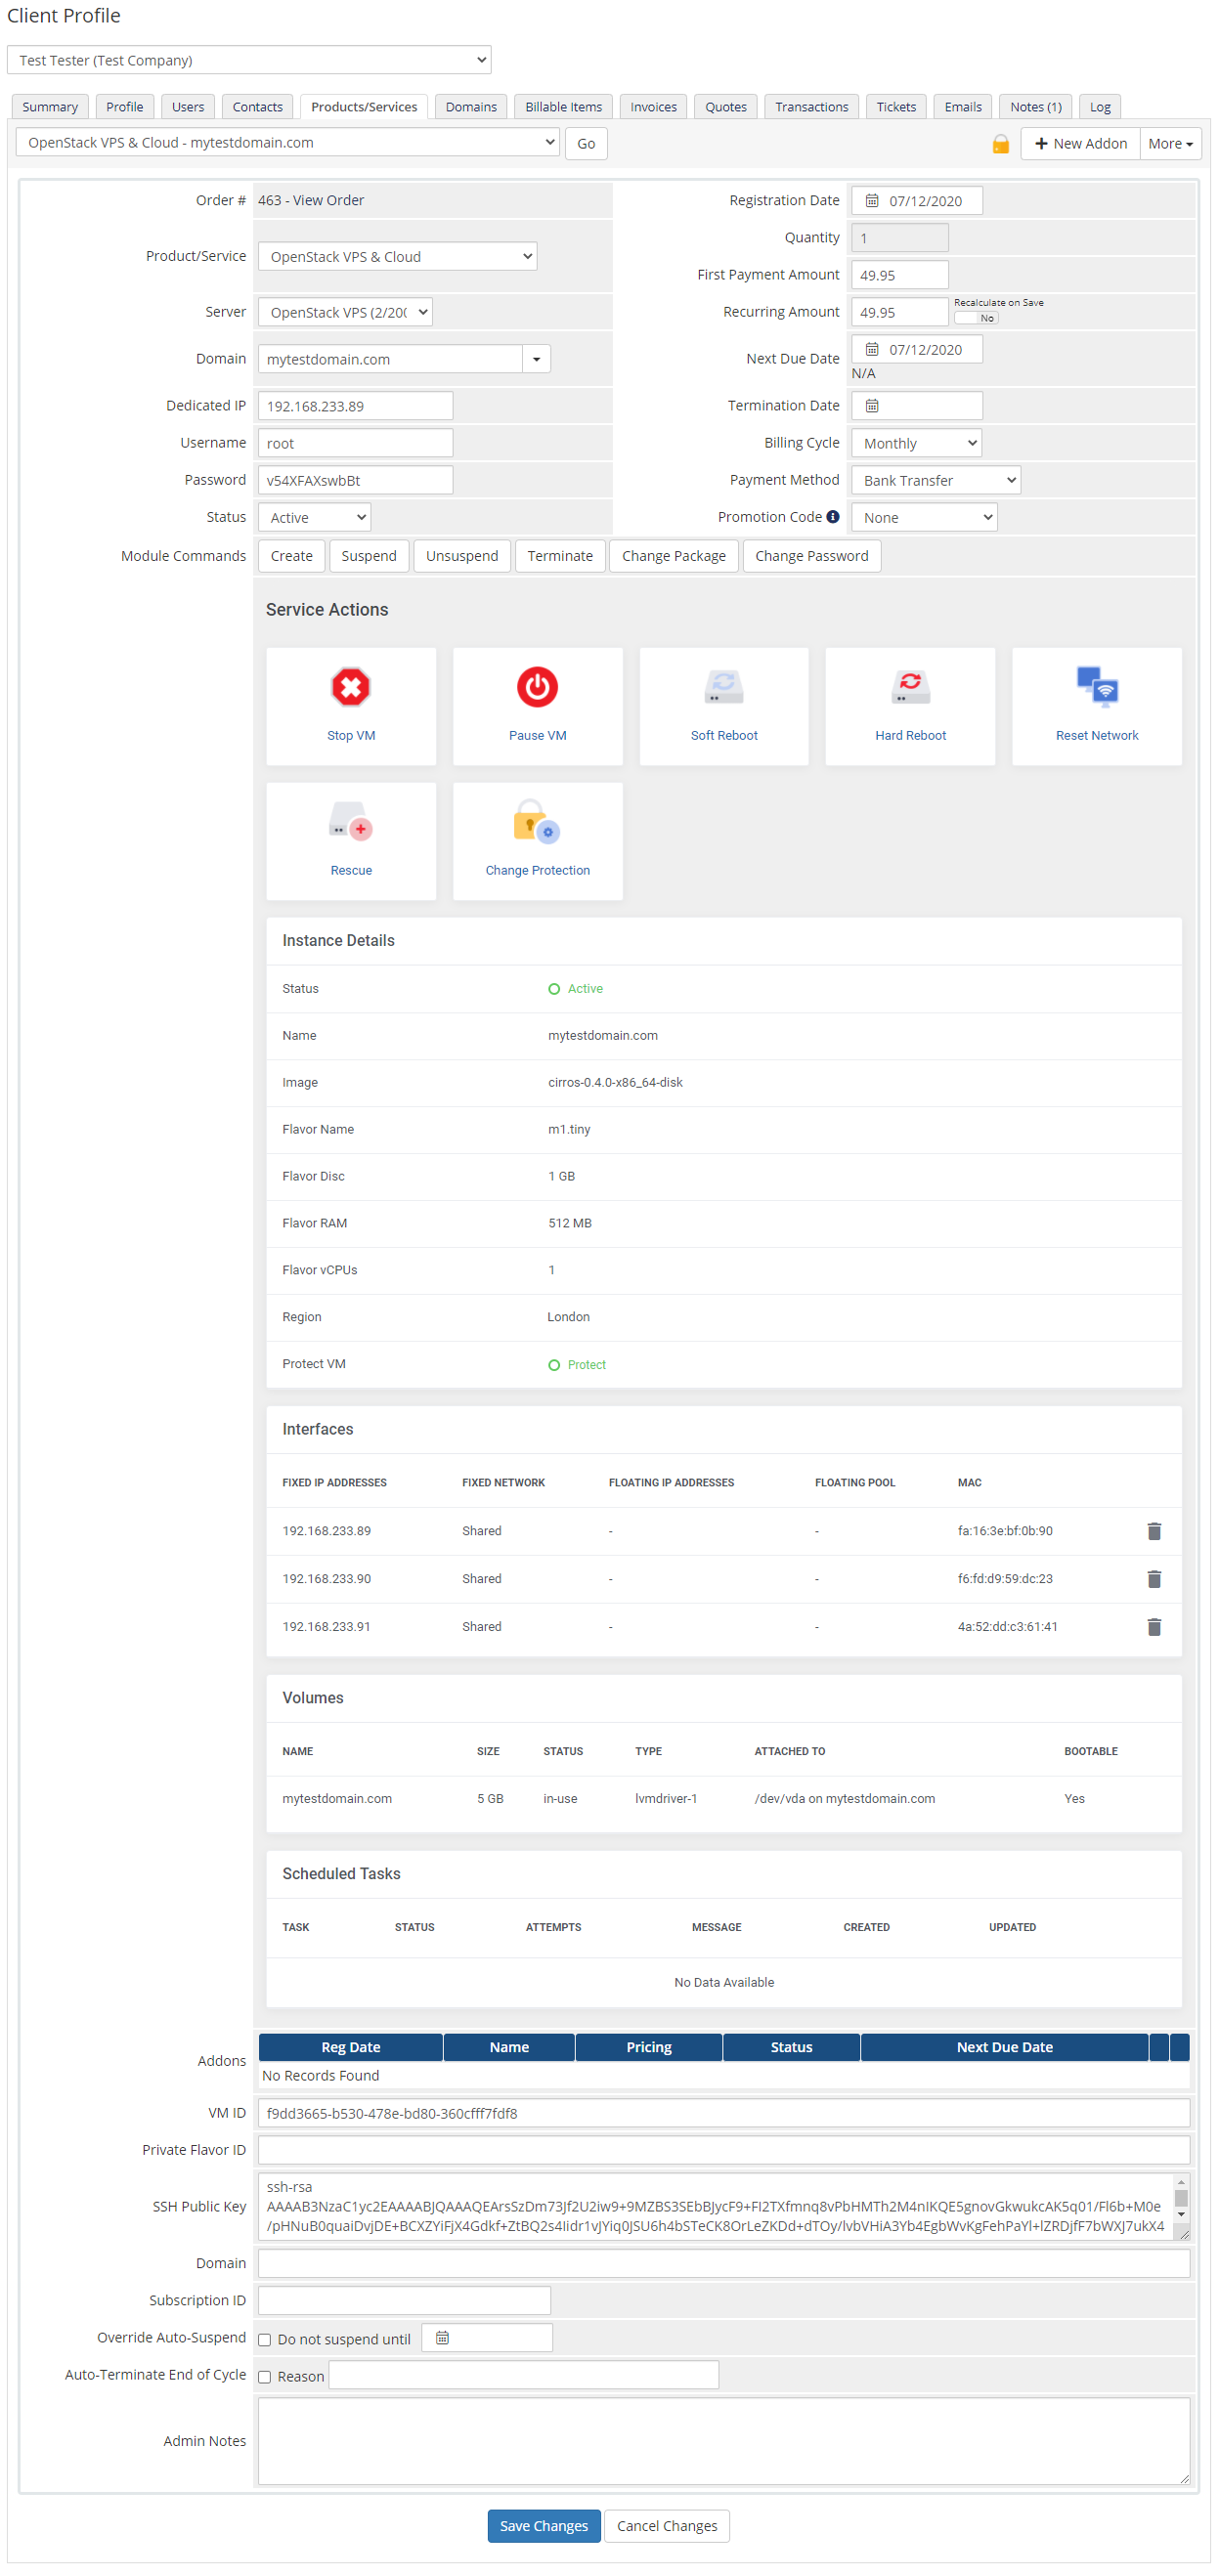 OpenStack VPS & Cloud For WHMCS: Module Screenshot 9